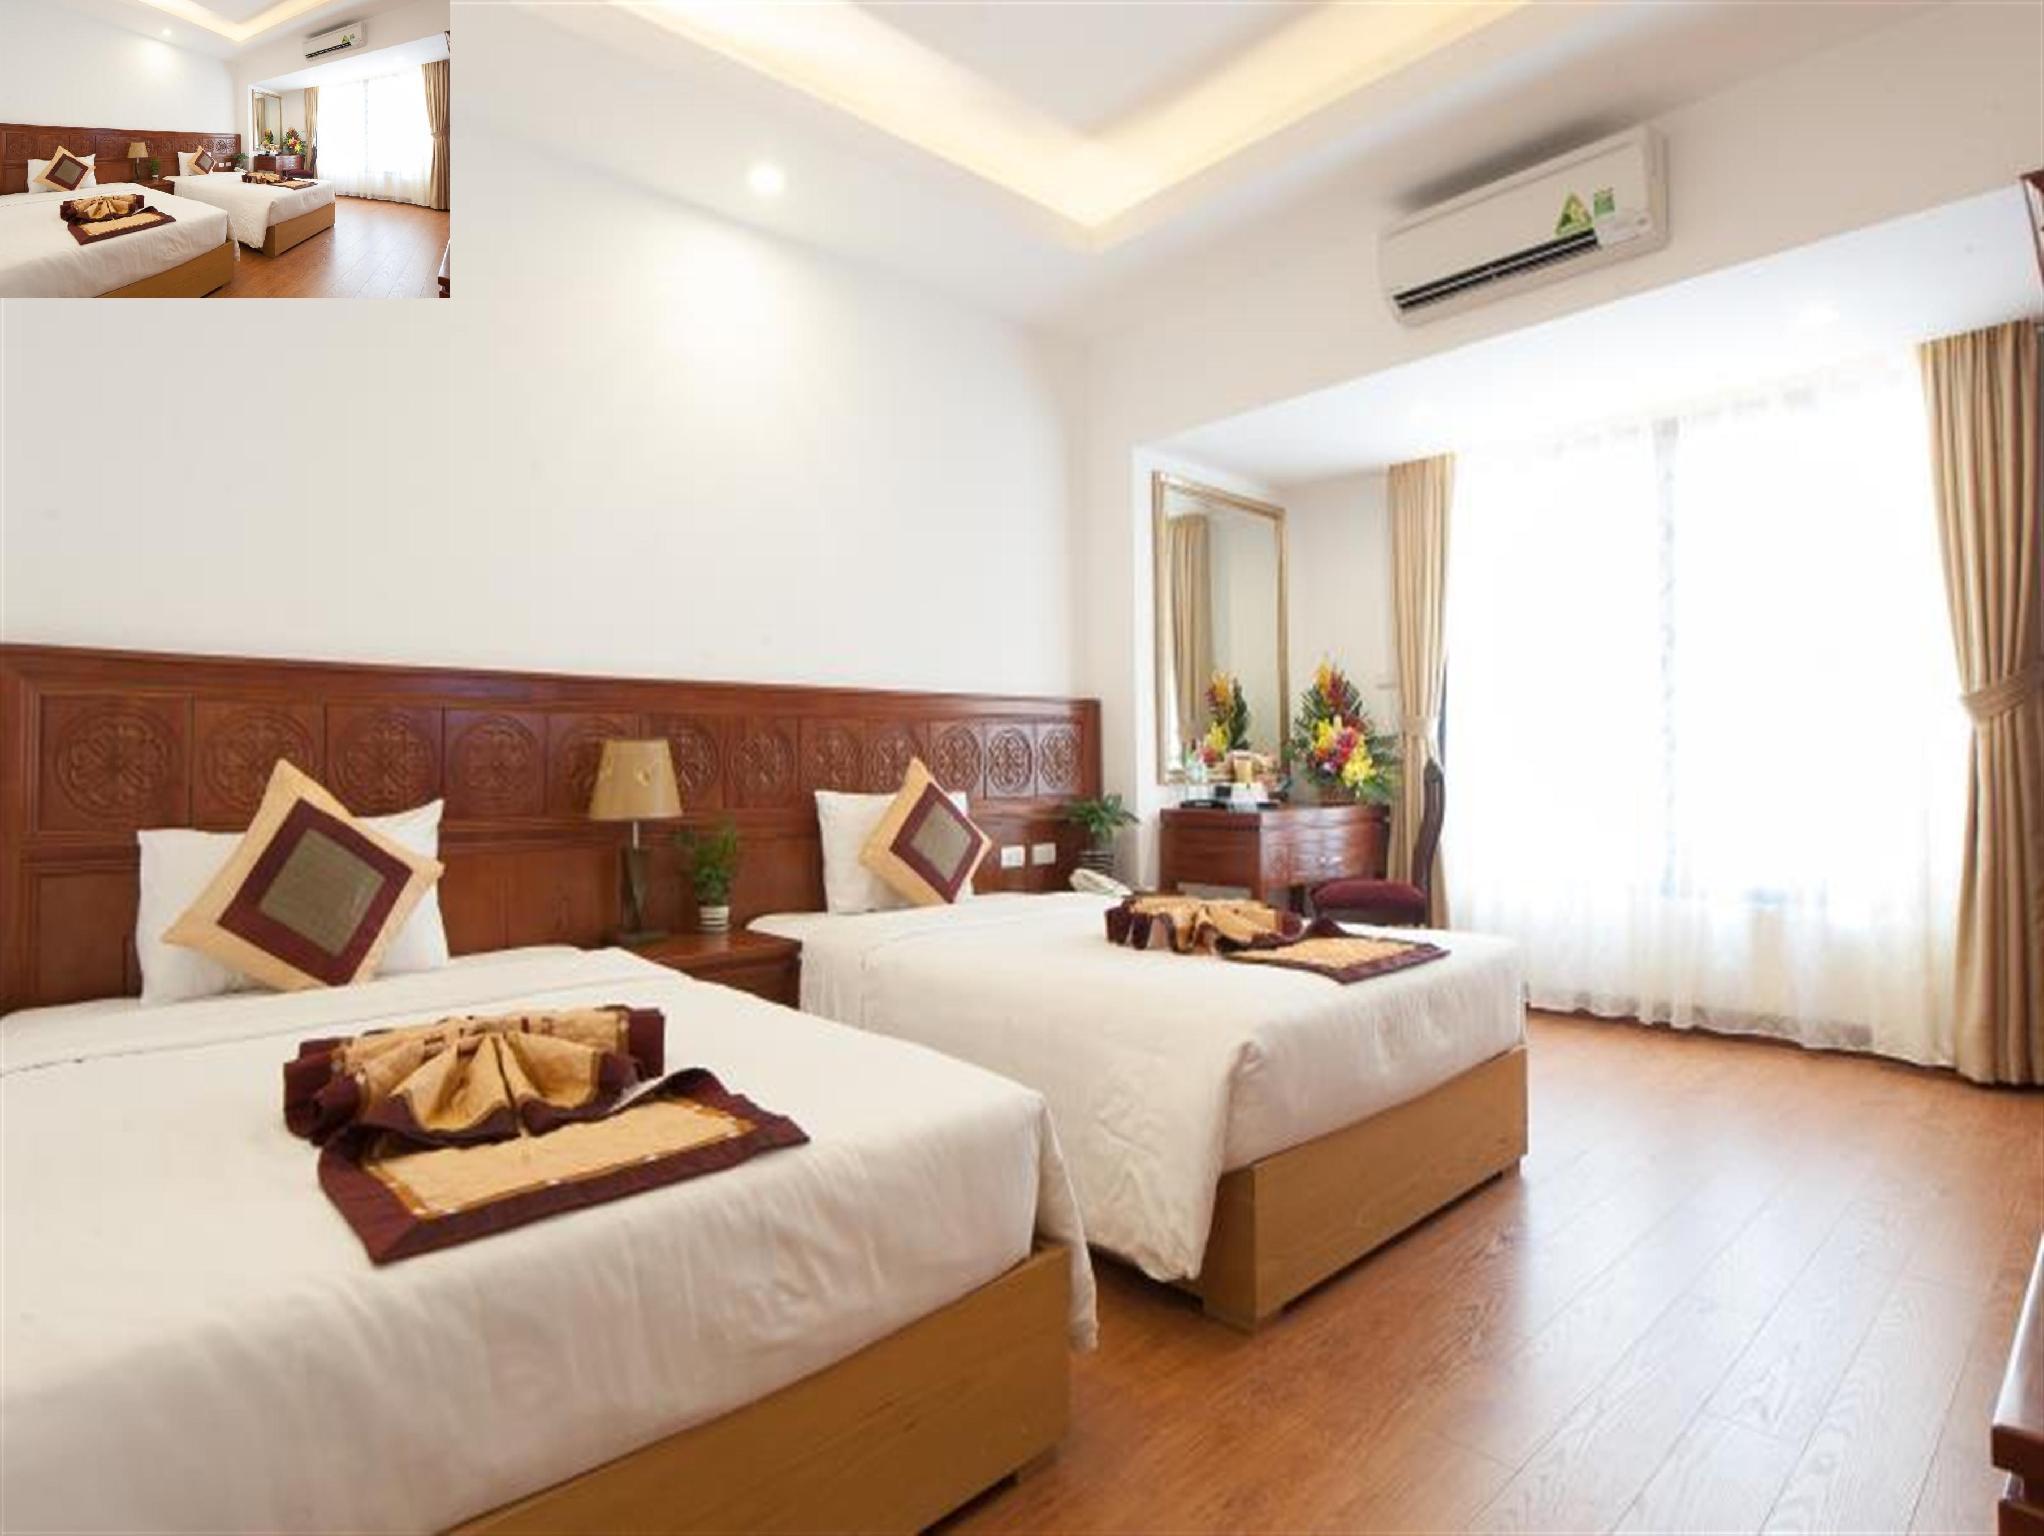 Le Foyer Hotel Hanoi Reviews : Le foyer hotel hanoi in vietnam room deals photos reviews